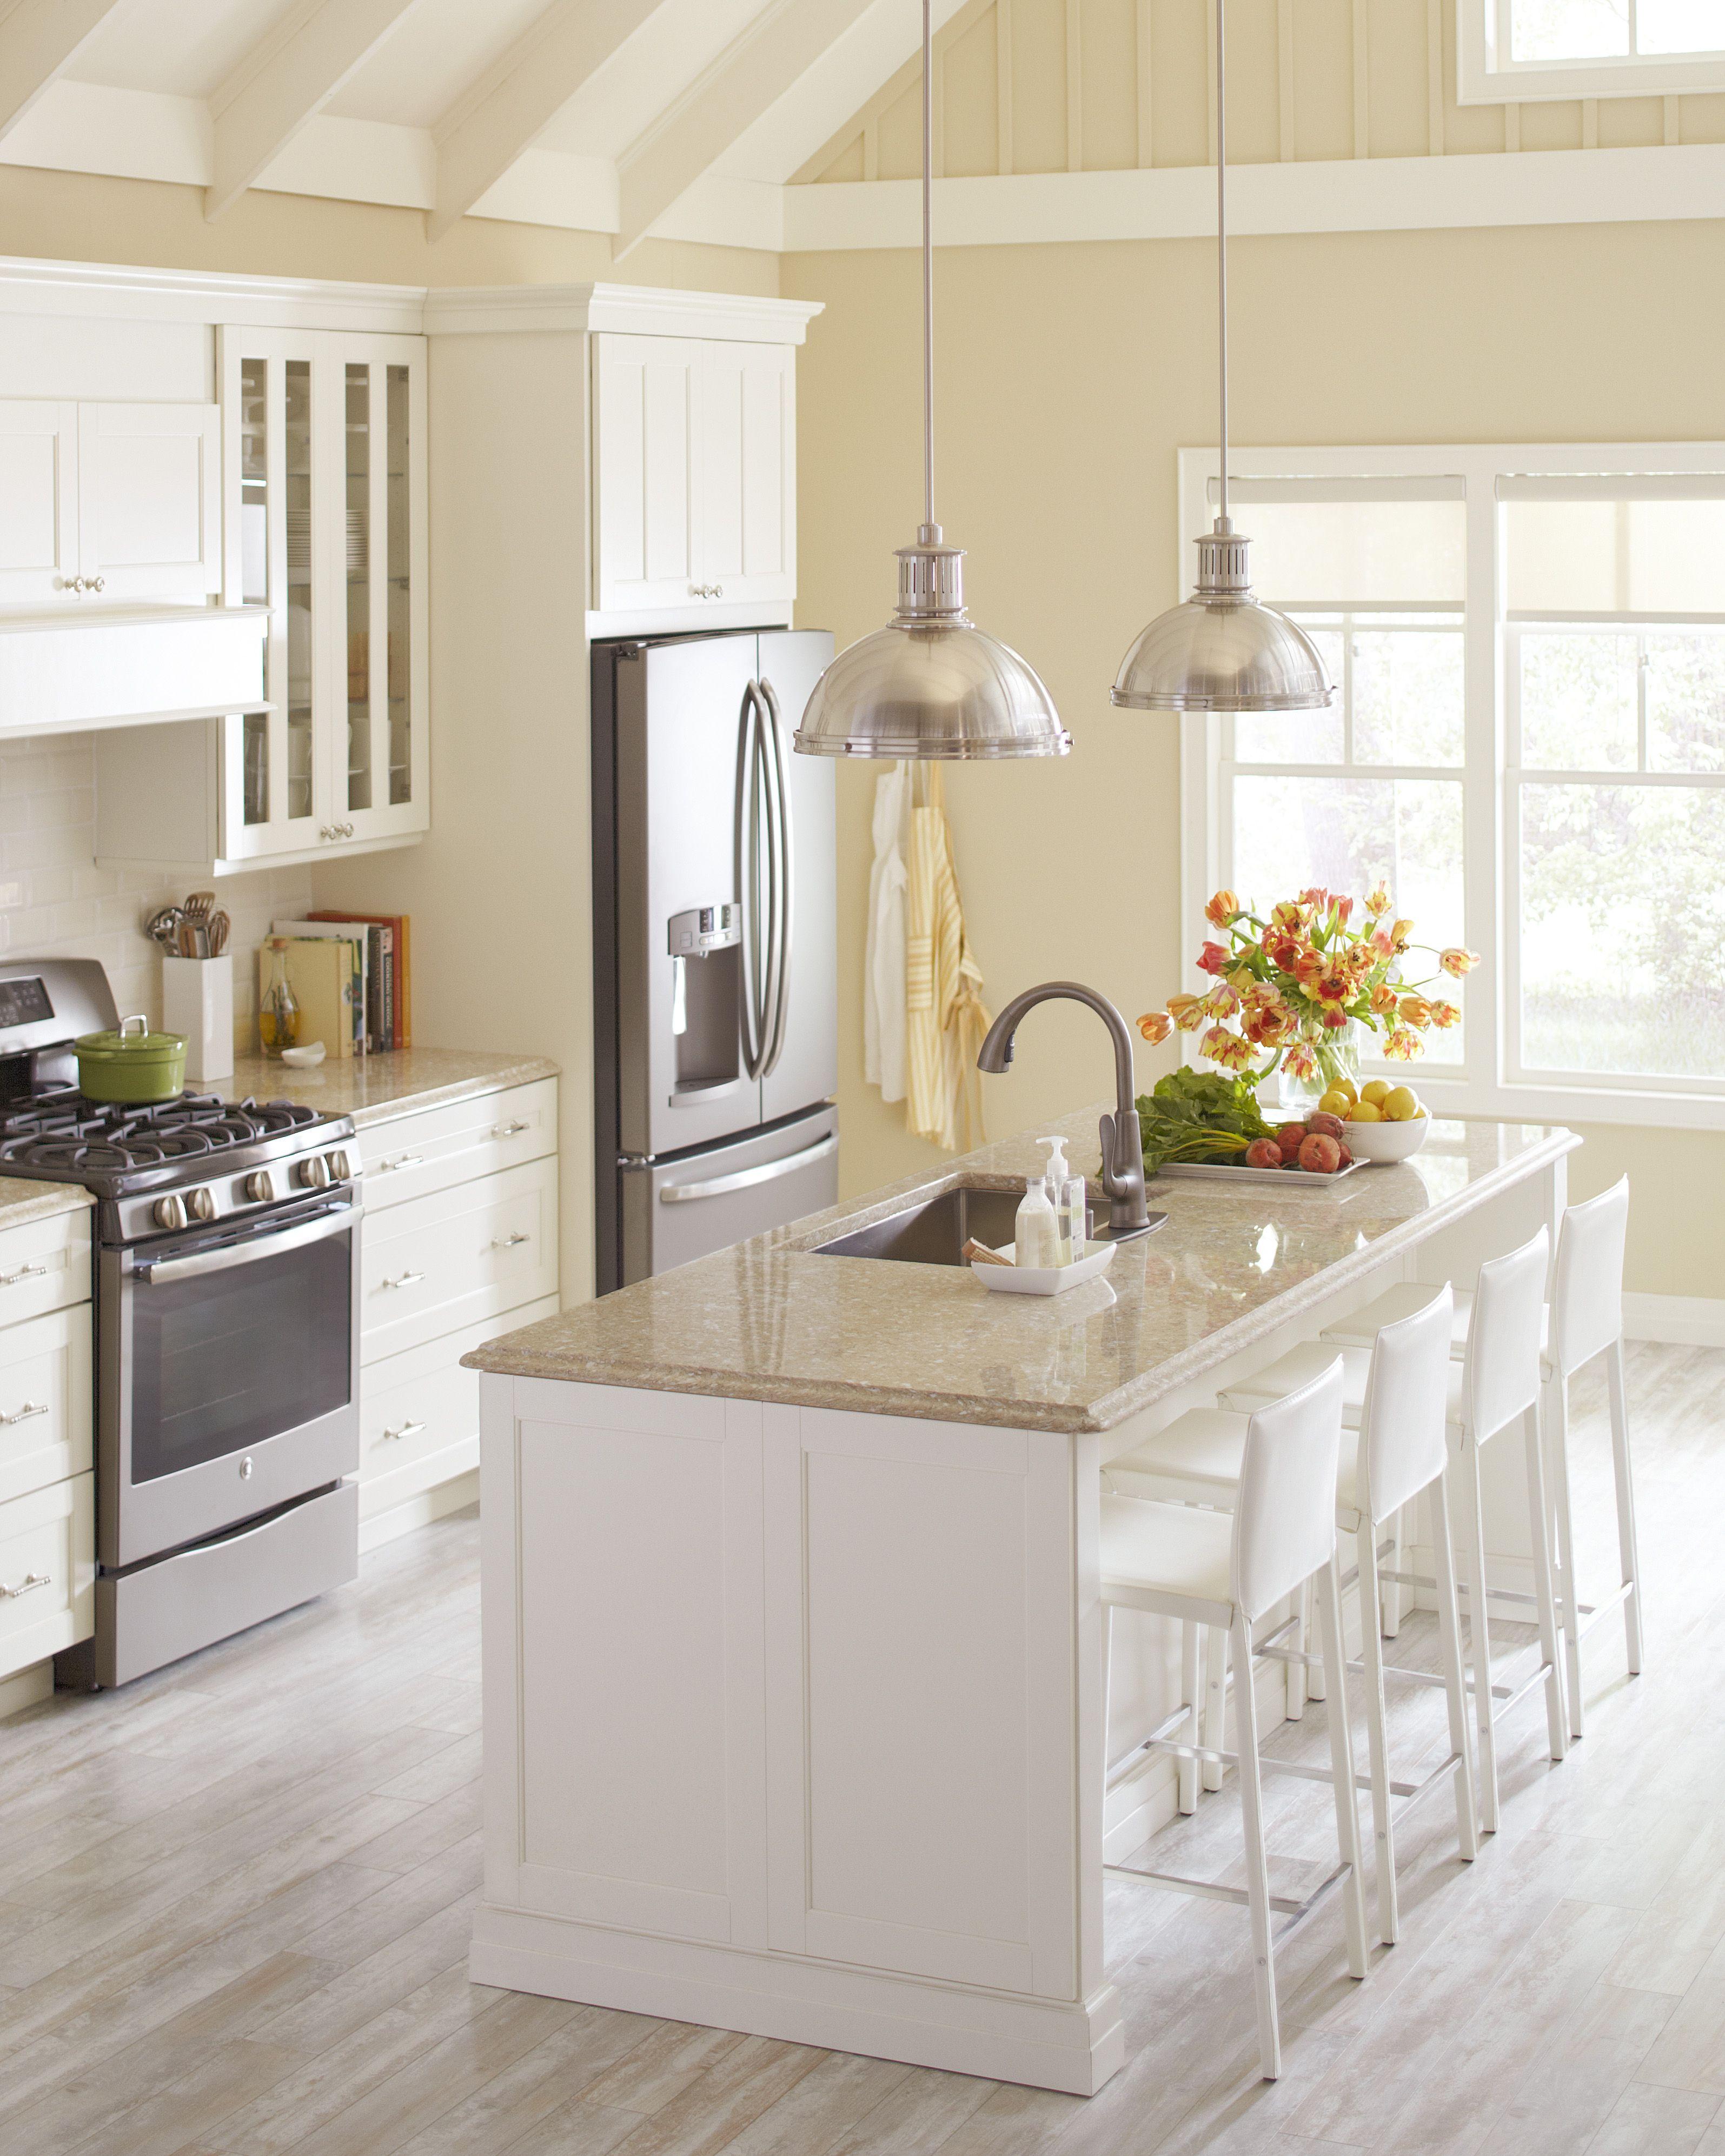 Home Depot Quartz And Corian Countertops Beige Kitchen Corian Countertops Quartz Kitchen Countertops